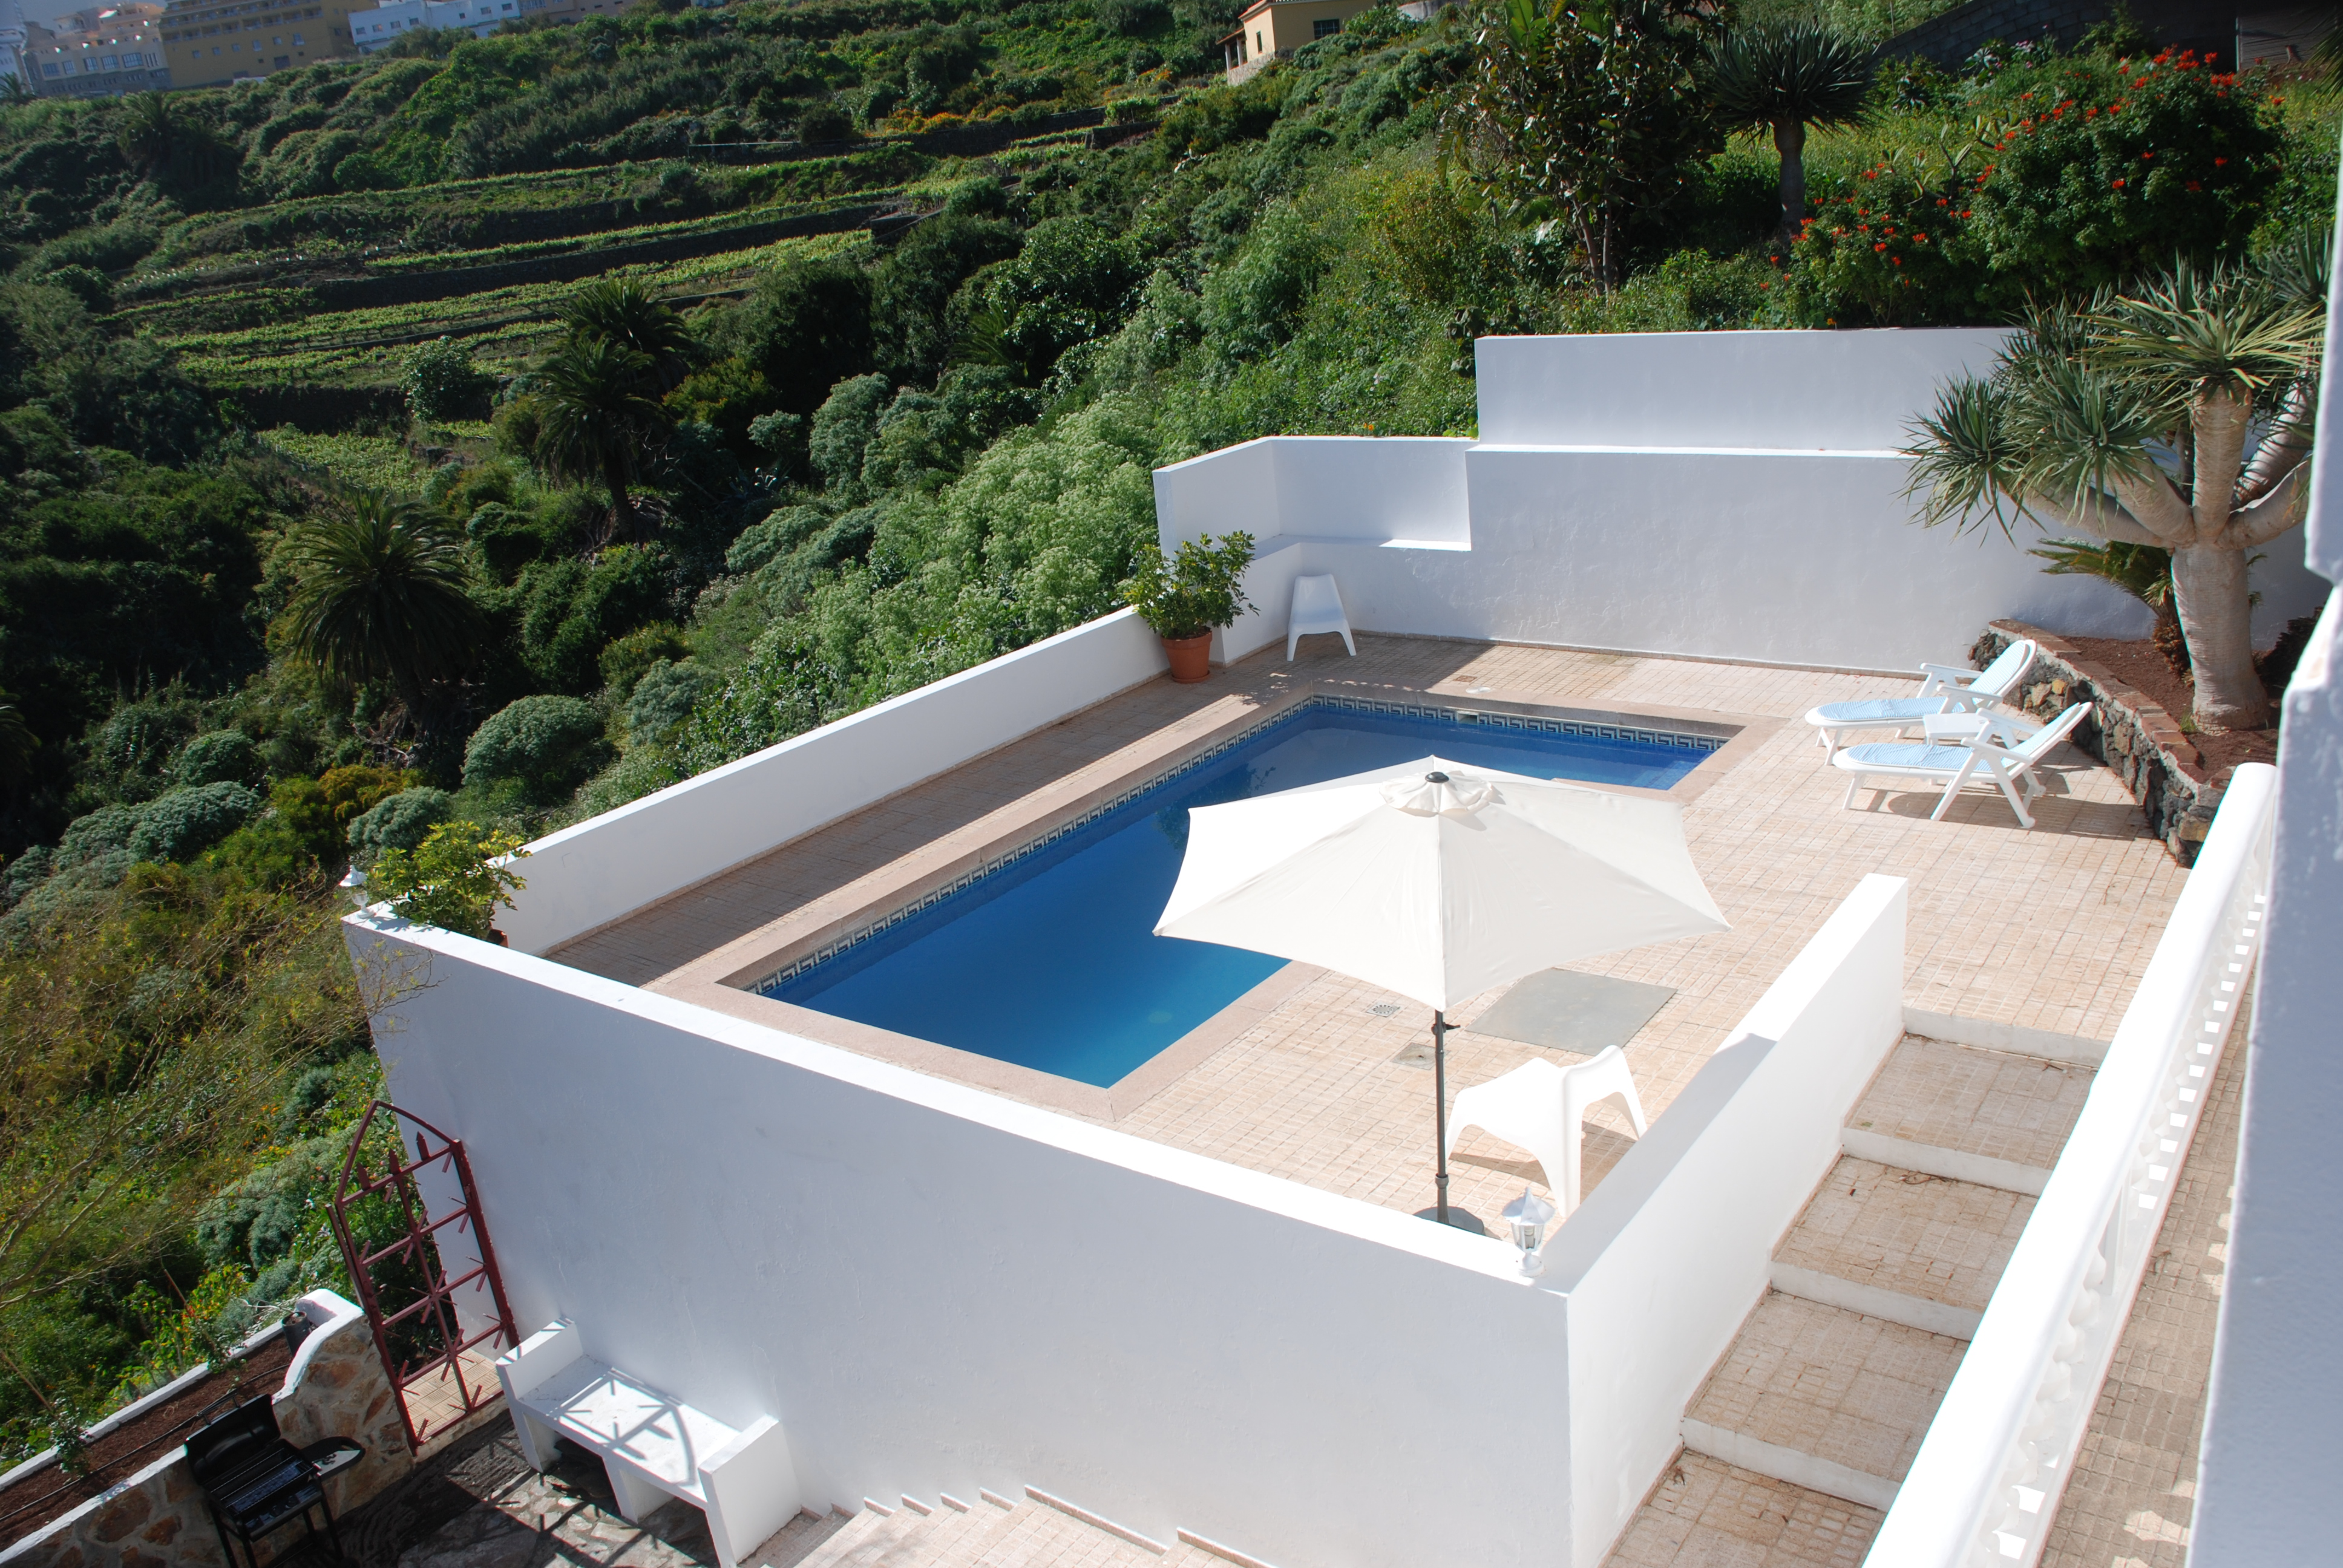 Maison de vacances Villa Vista La Quinta beheizbarer Pool kostenloses WLAN Grill (2124407), Santa Ursula, Ténérife, Iles Canaries, Espagne, image 83